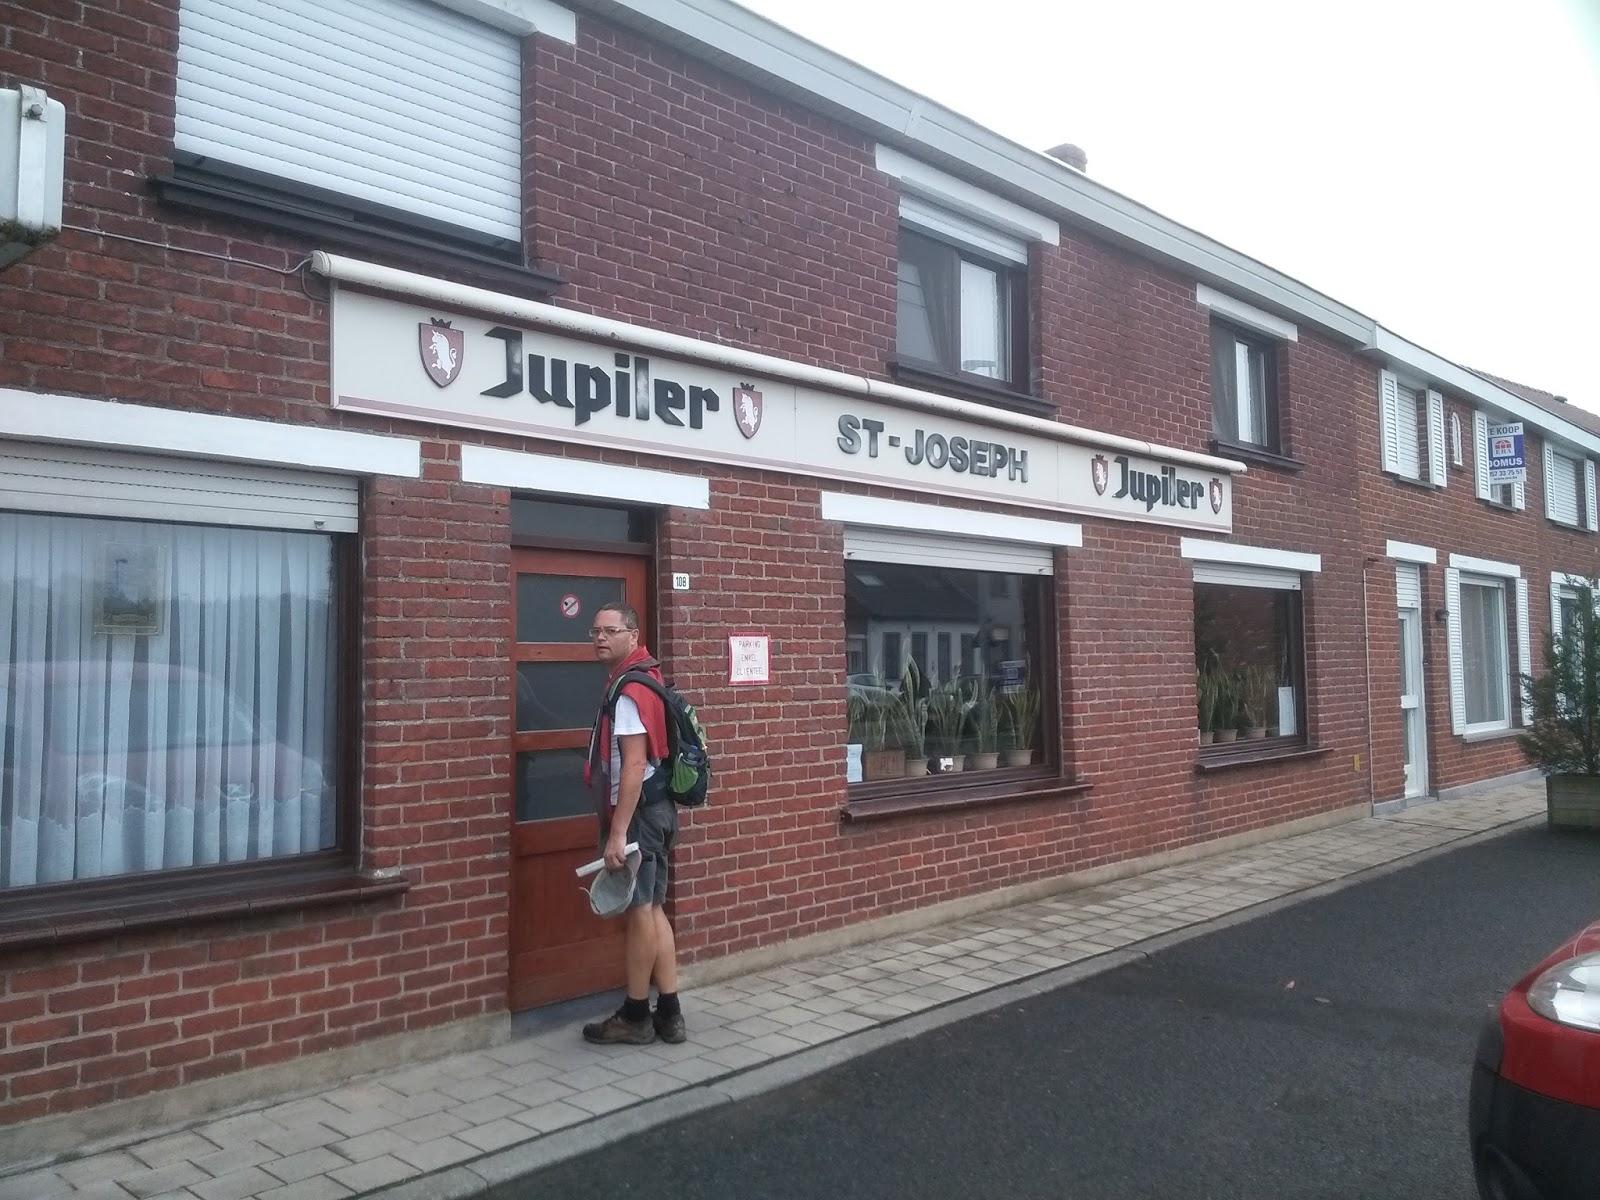 Café Sint Joseph in Haringe